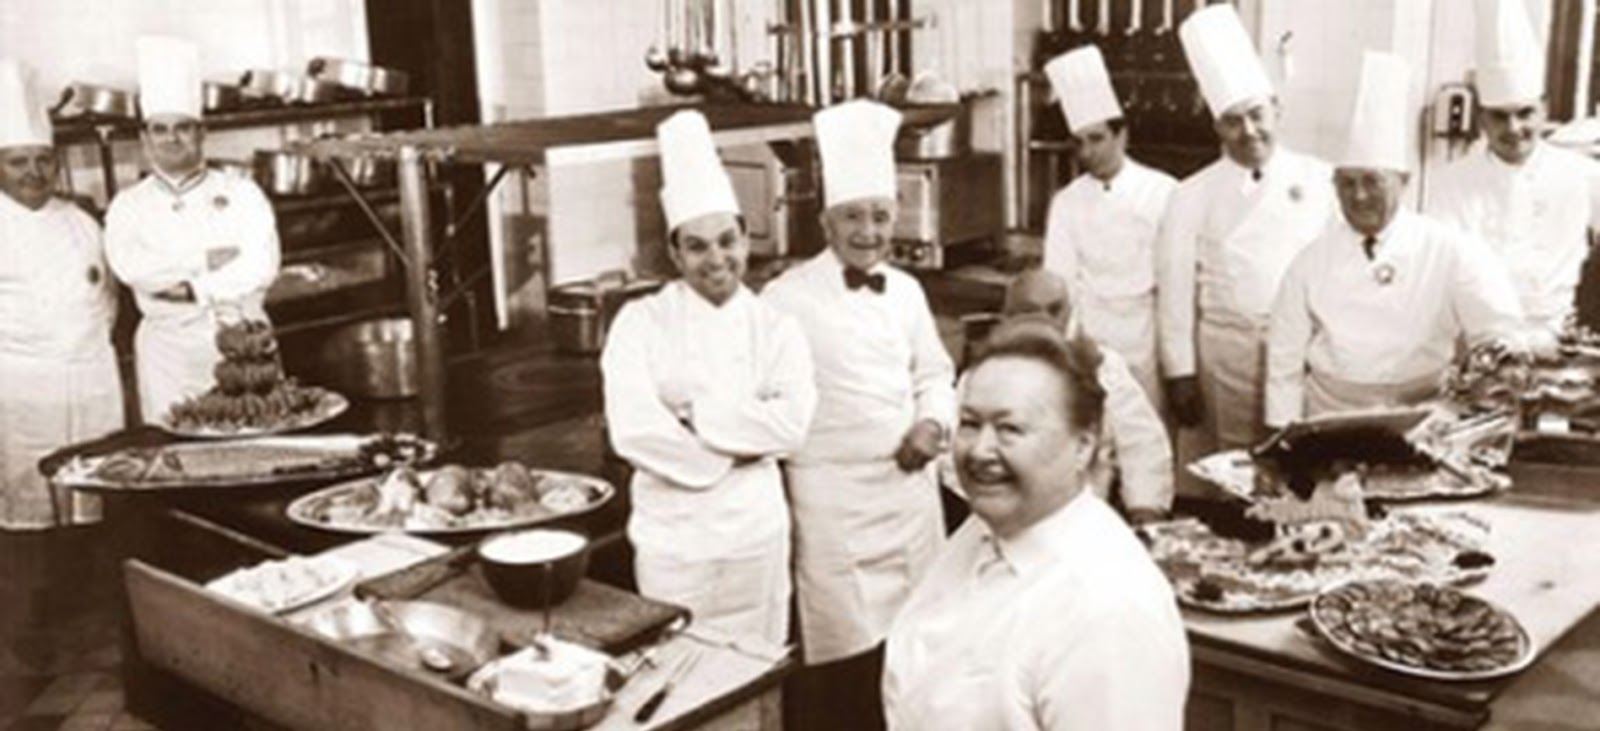 Culinary+History.jpg (1600×731)